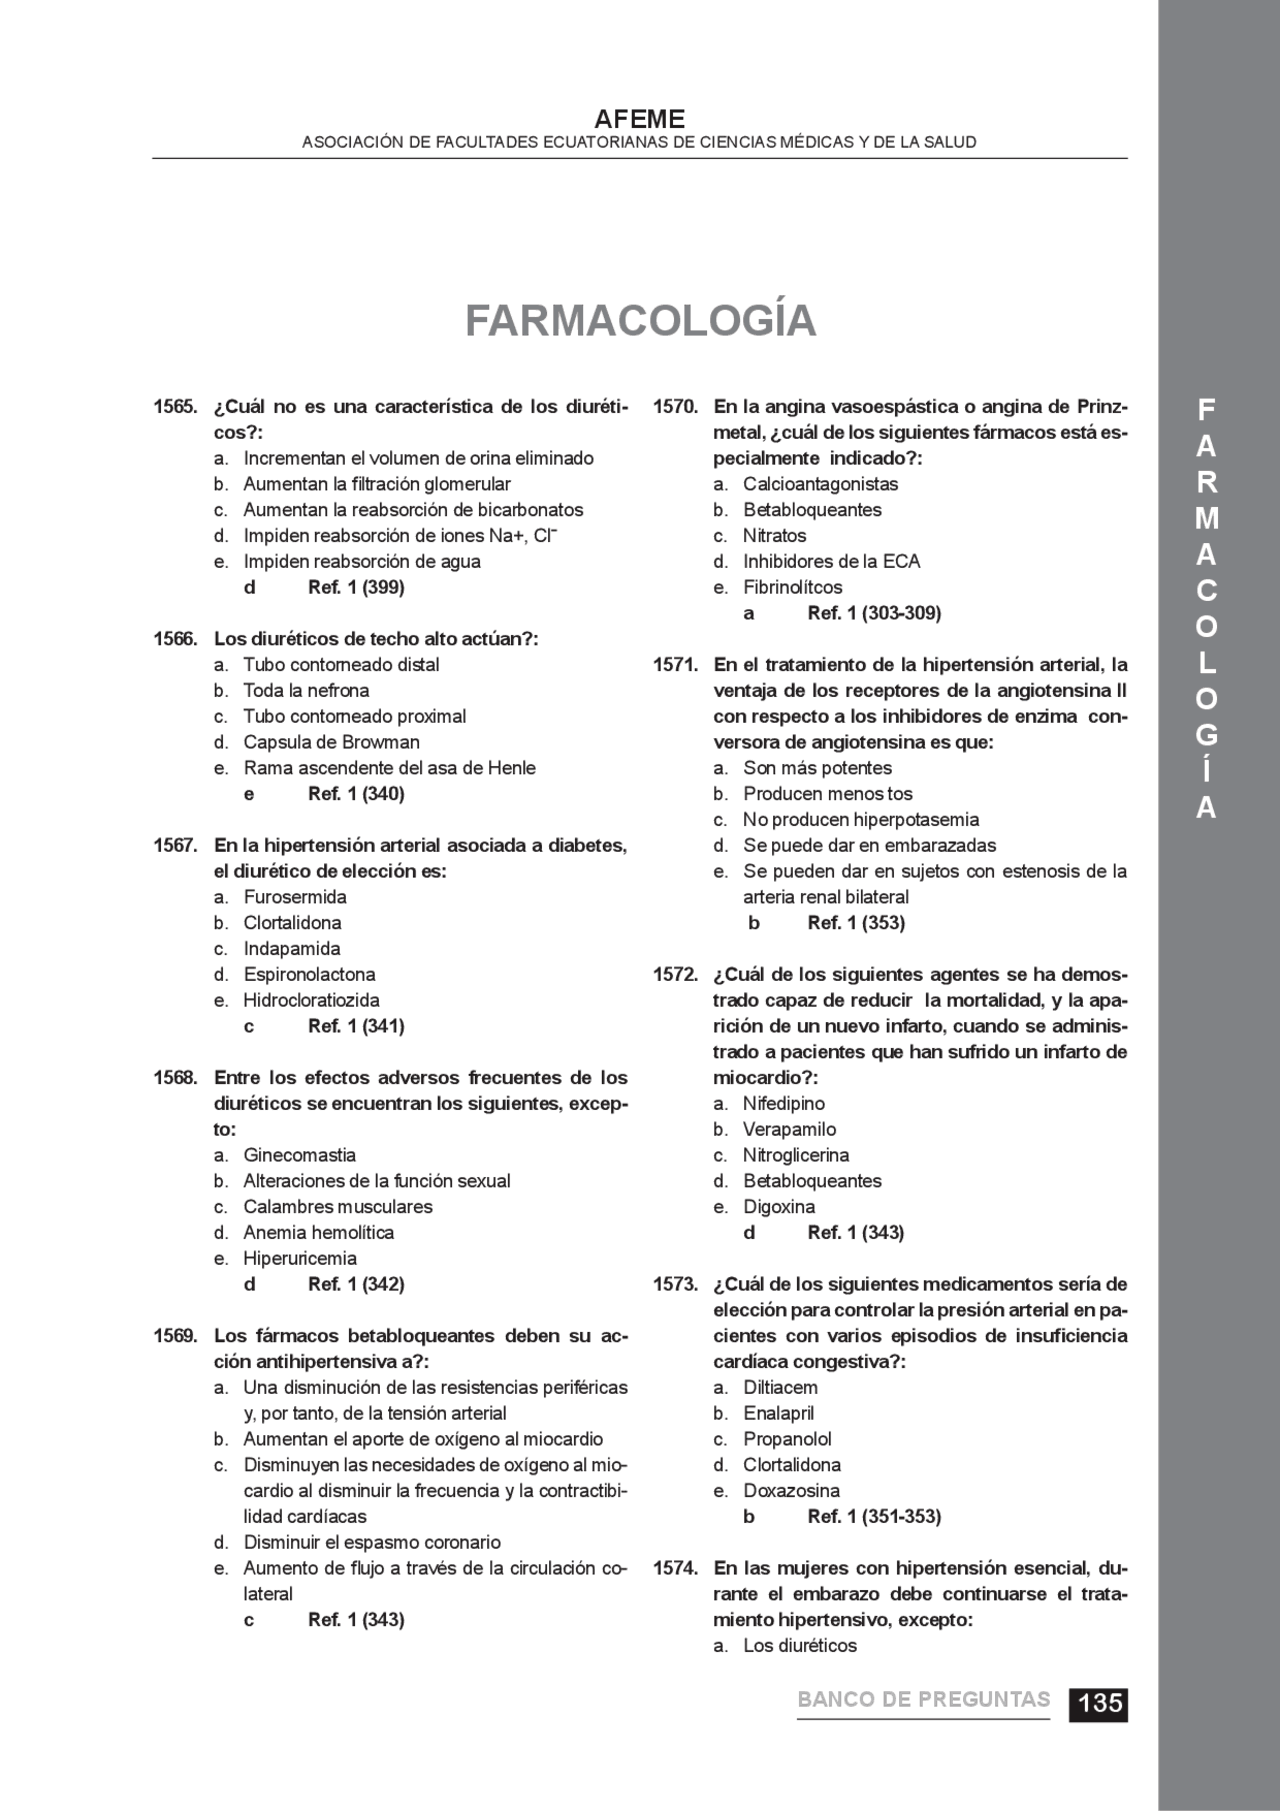 Examen Del Curso De Farmacologia Tes Sobre Farmacologia General 128 Preguntas Docsity